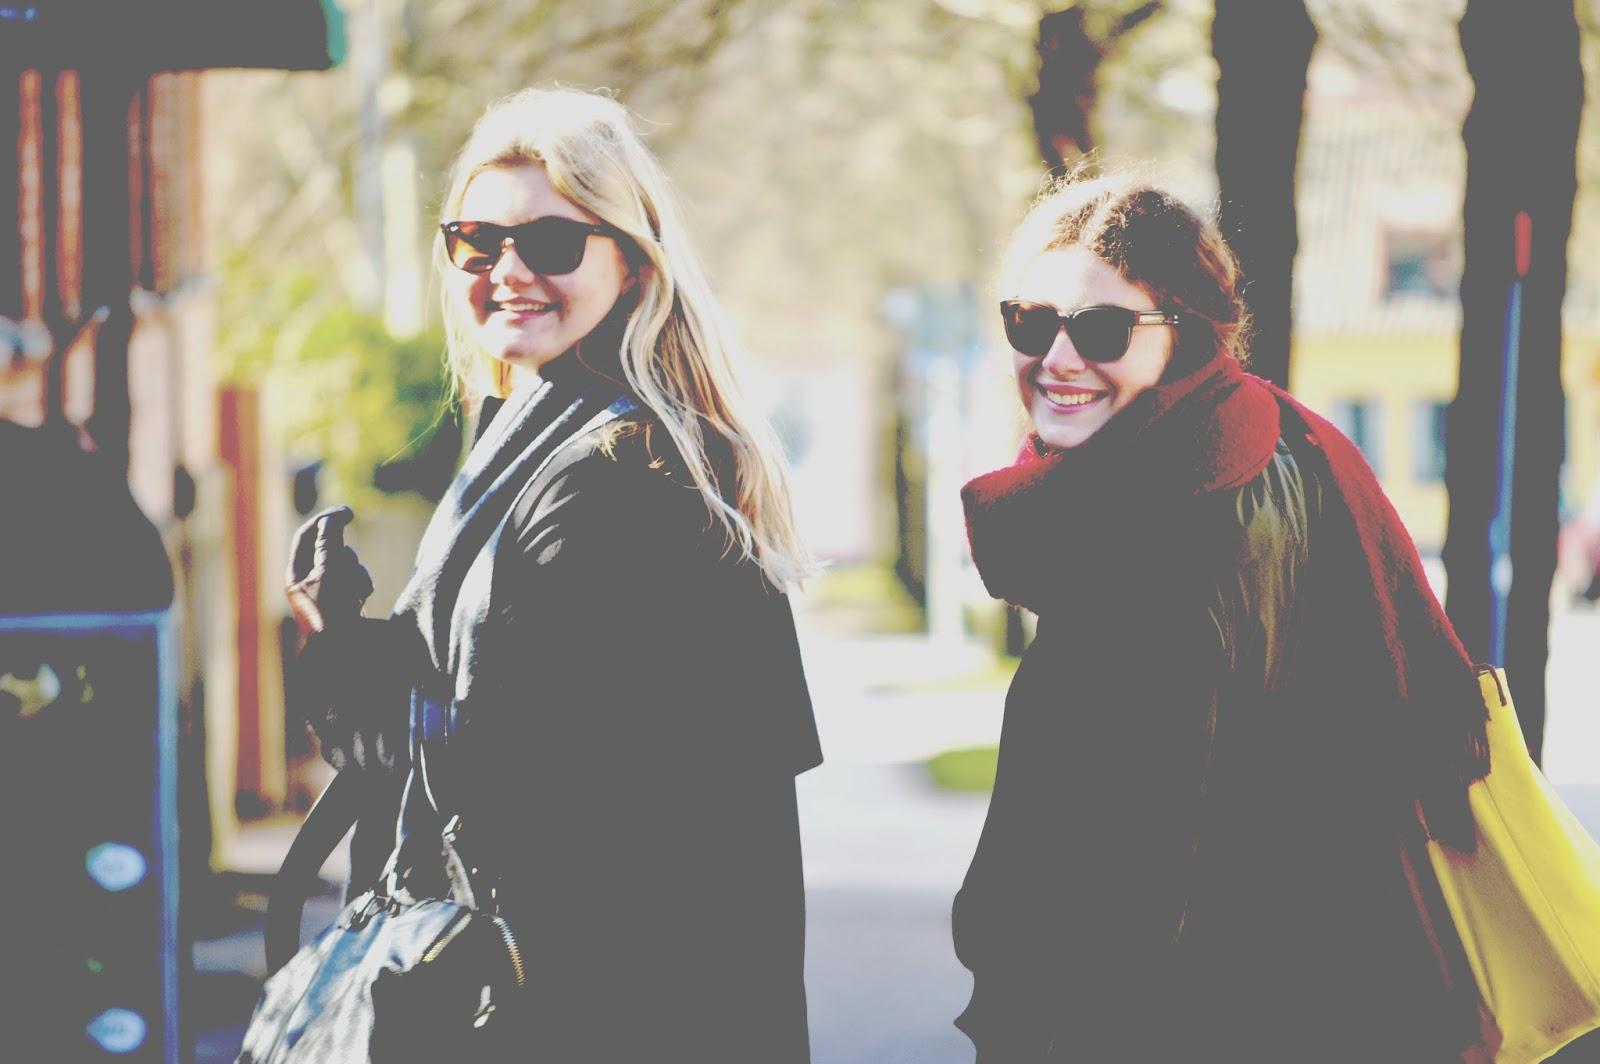 eskort i borås träffa tjejer online